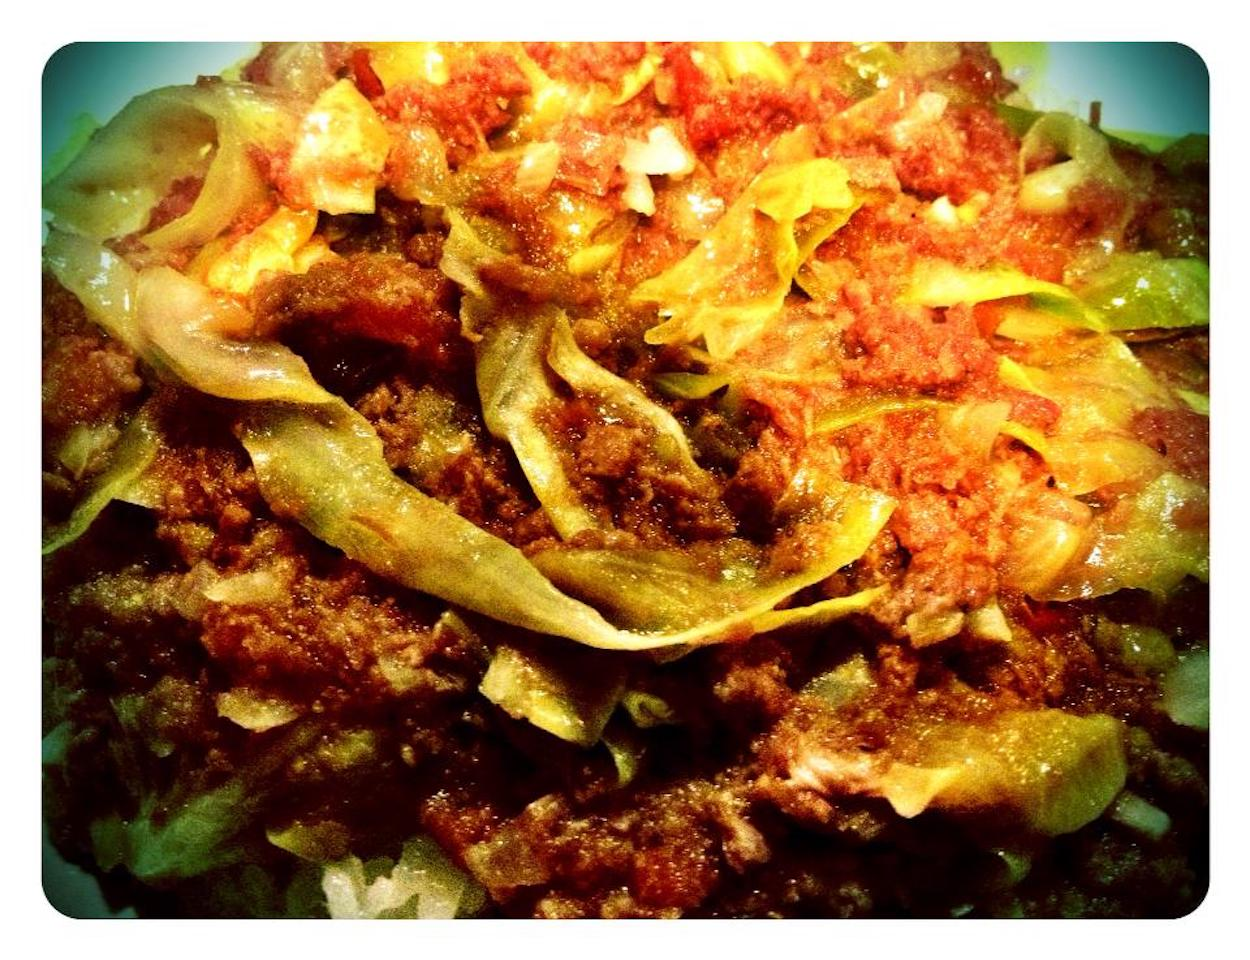 Filipino Corned Beef and Cabbage